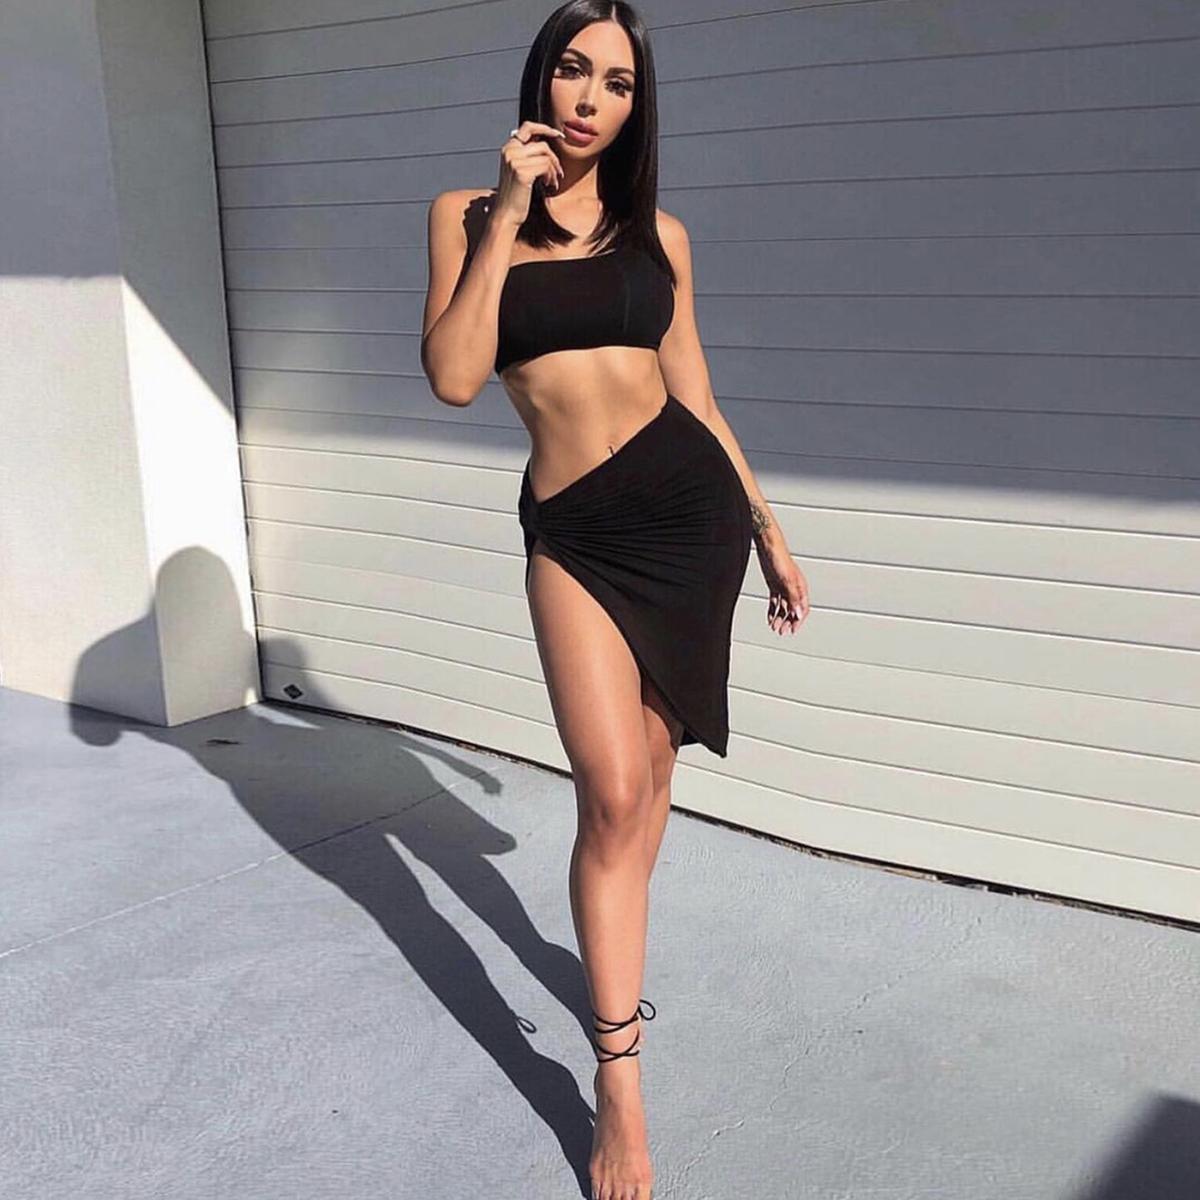 Seksi Dua Piece Gaun Wanita Gaun Bodycon Wanita Top Rok Dua Sepotong Set Pakaian Wanita